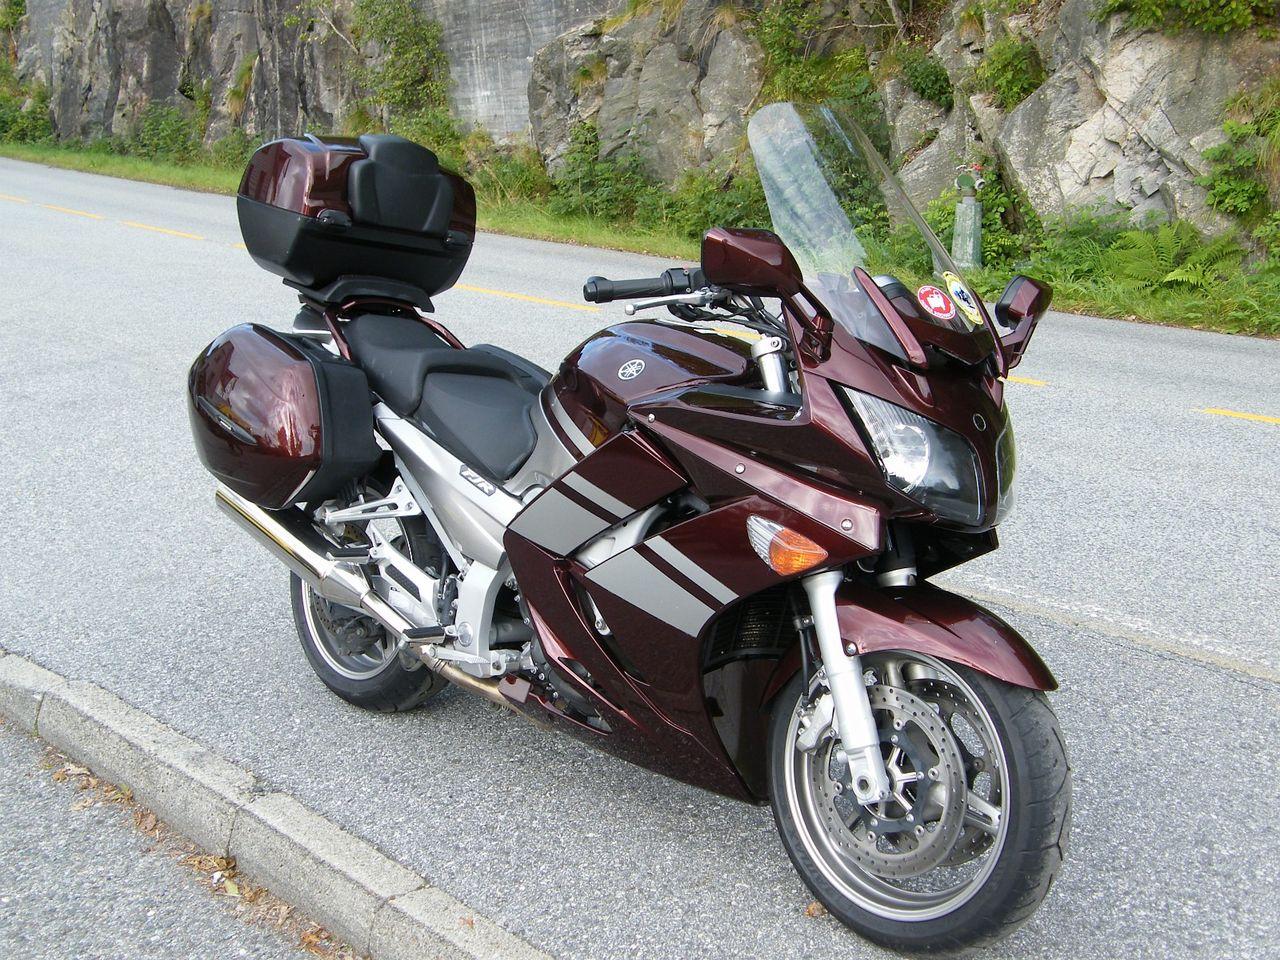 yamaha fjr 1300 d 39 occasion epinal 88 moto scooter motos d 39 occasion. Black Bedroom Furniture Sets. Home Design Ideas